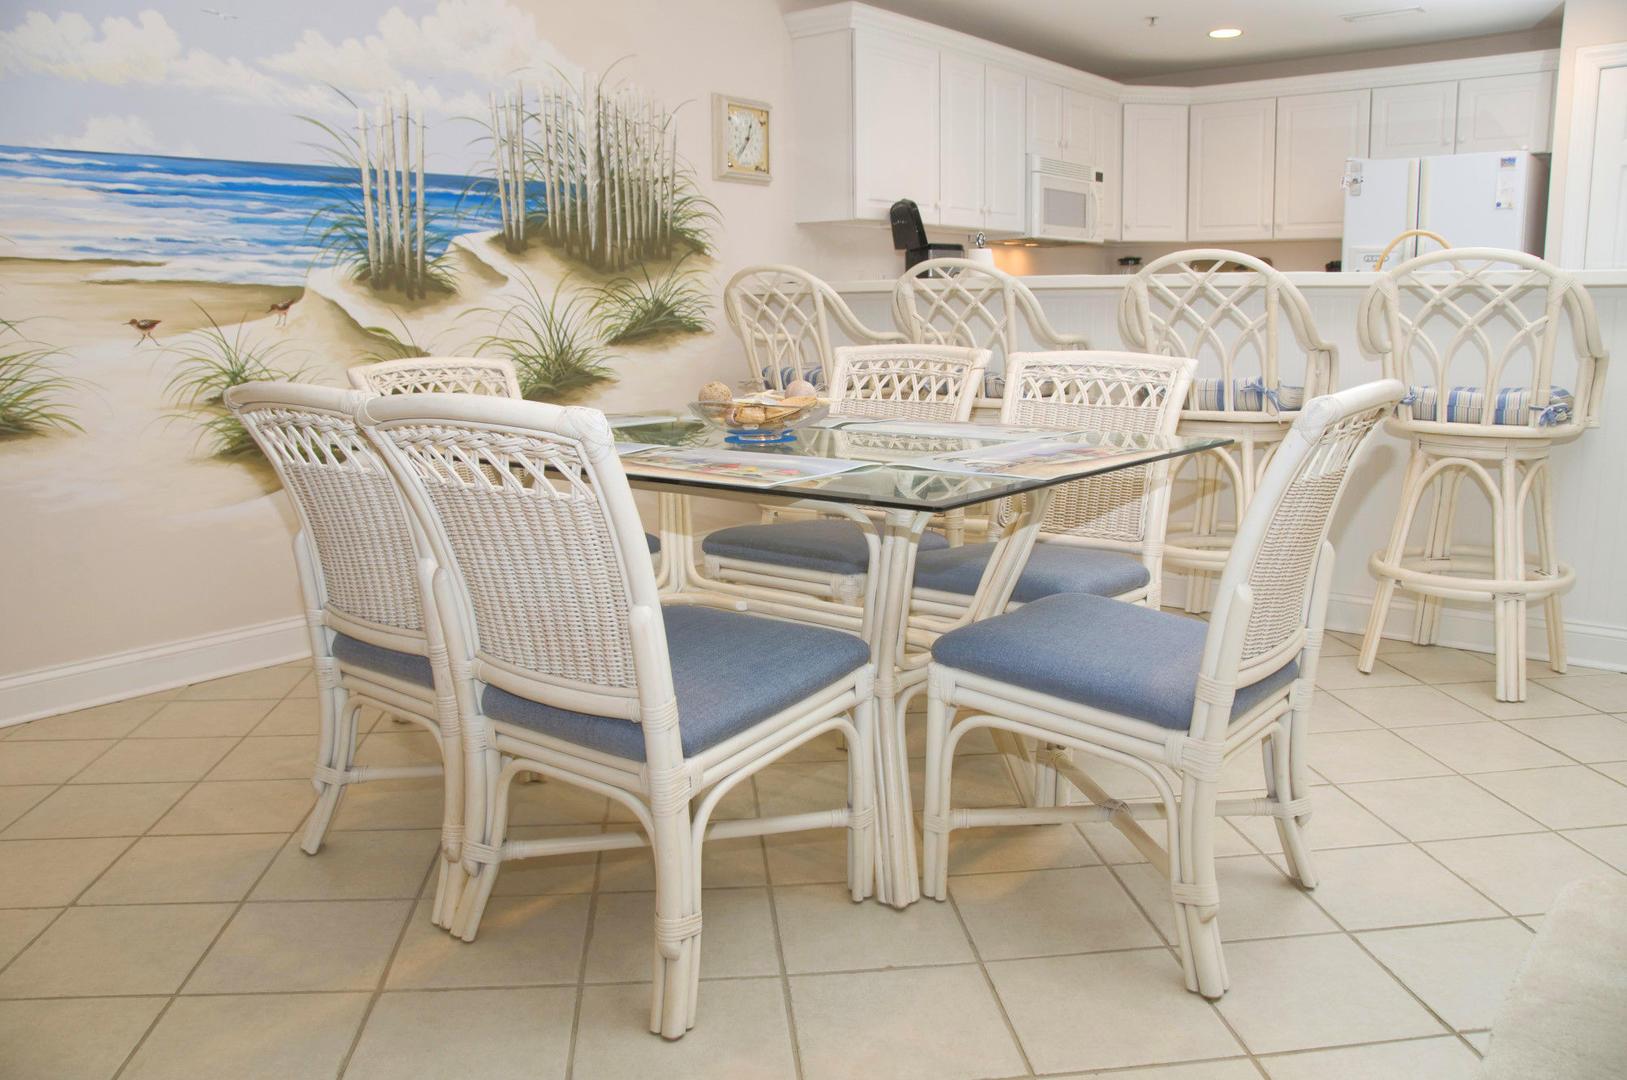 Sunset Bay I 301 - Dining Area